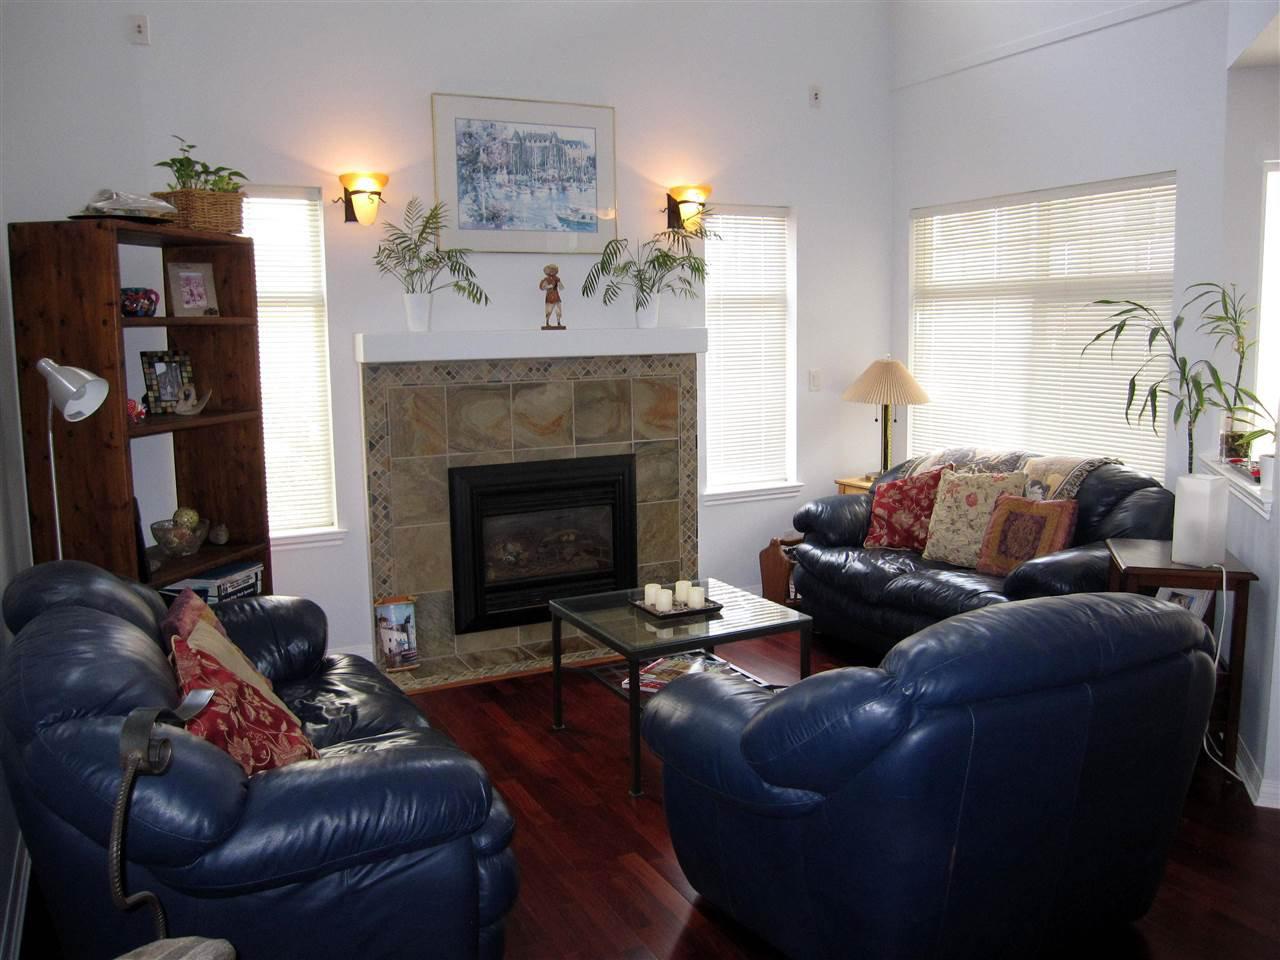 "Photo 3: Photos: 14 23343 KANAKA Way in Maple Ridge: Cottonwood MR Townhouse for sale in ""COTTONWOOD GROVE"" : MLS®# R2164779"